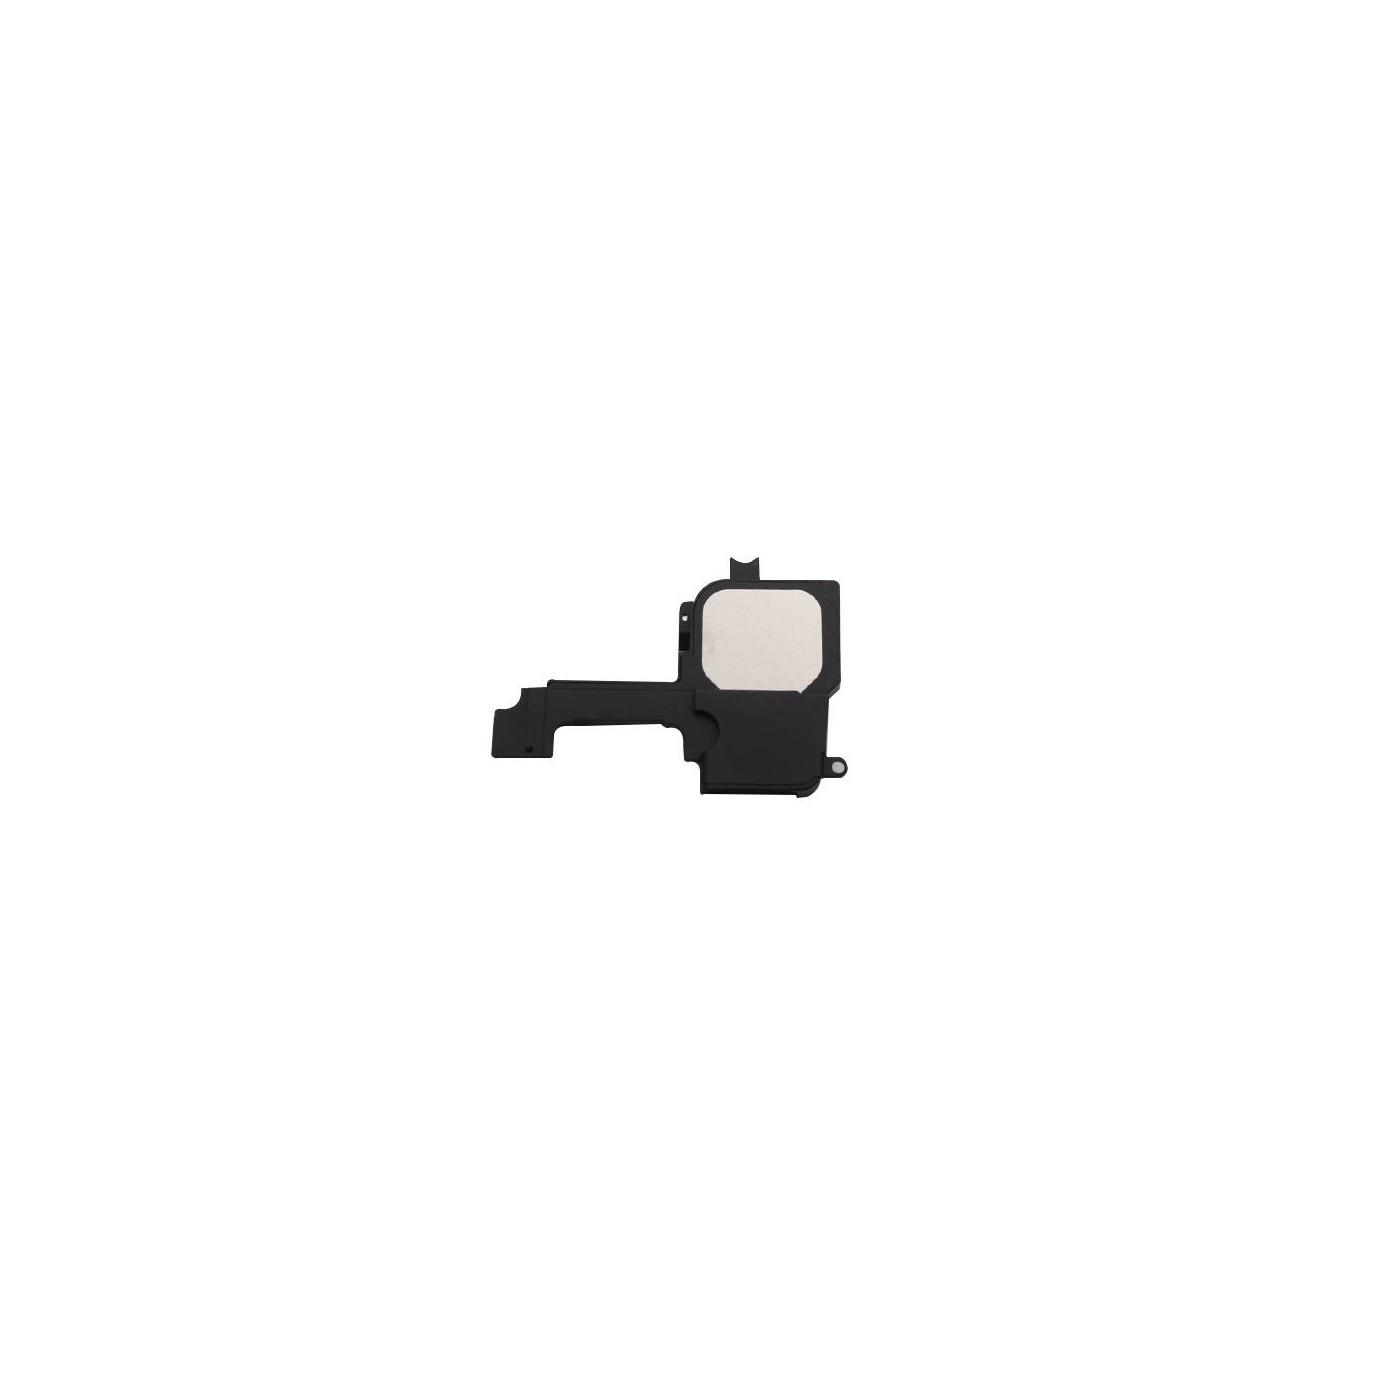 Loud speaker buzzer Iphone 5 ricambio casse altoparlante inferiore